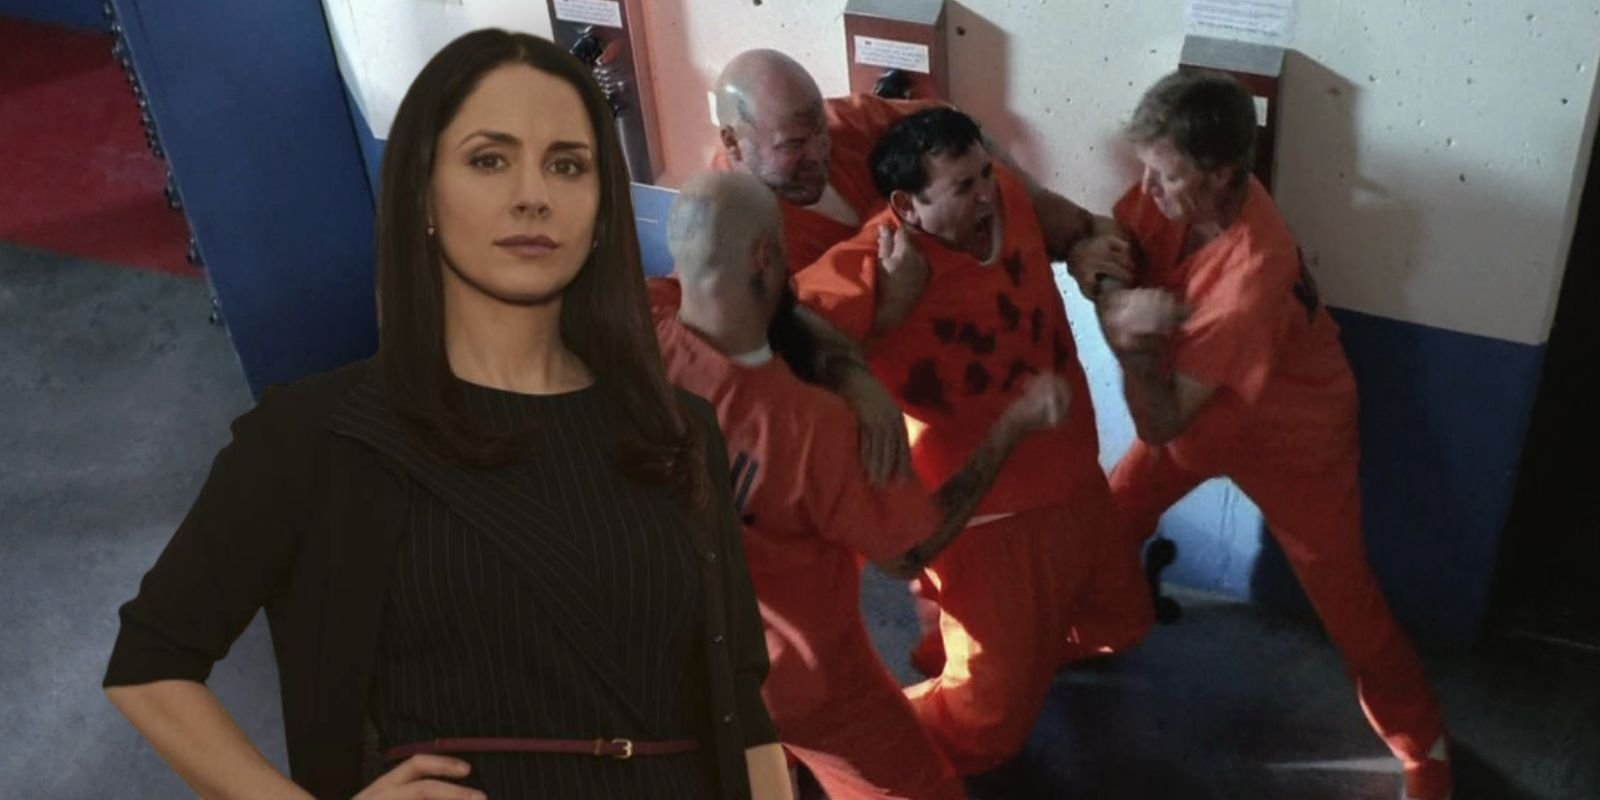 Better Call Saul Season 5 Sets Up Breaking Bad's Walt Prison Killings